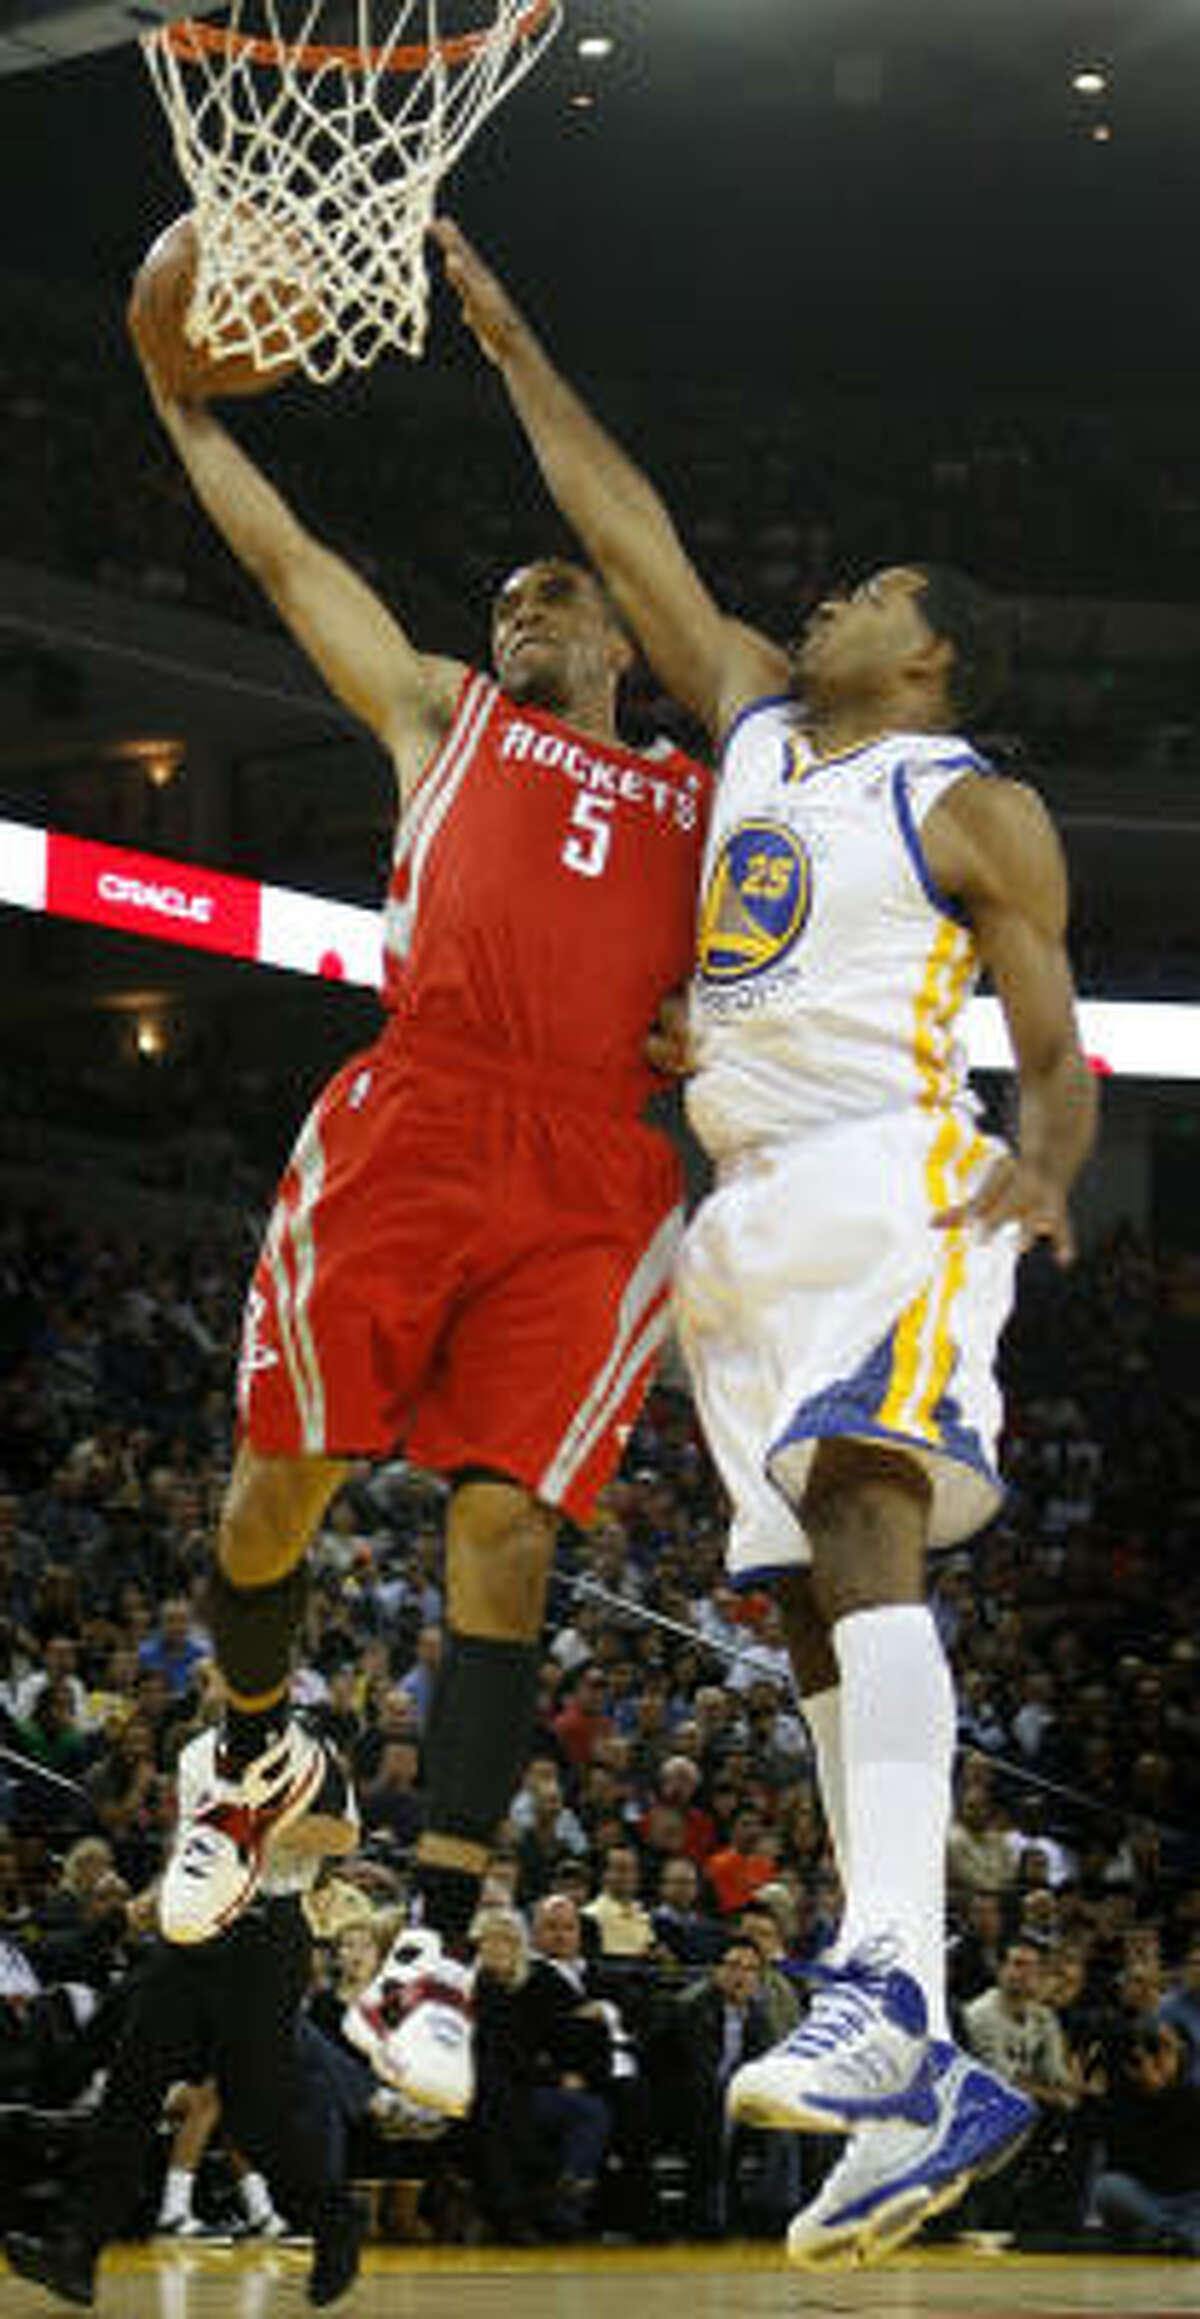 Rockets' Courtney Lee draws a foul from Warriors' Rodney Carney.